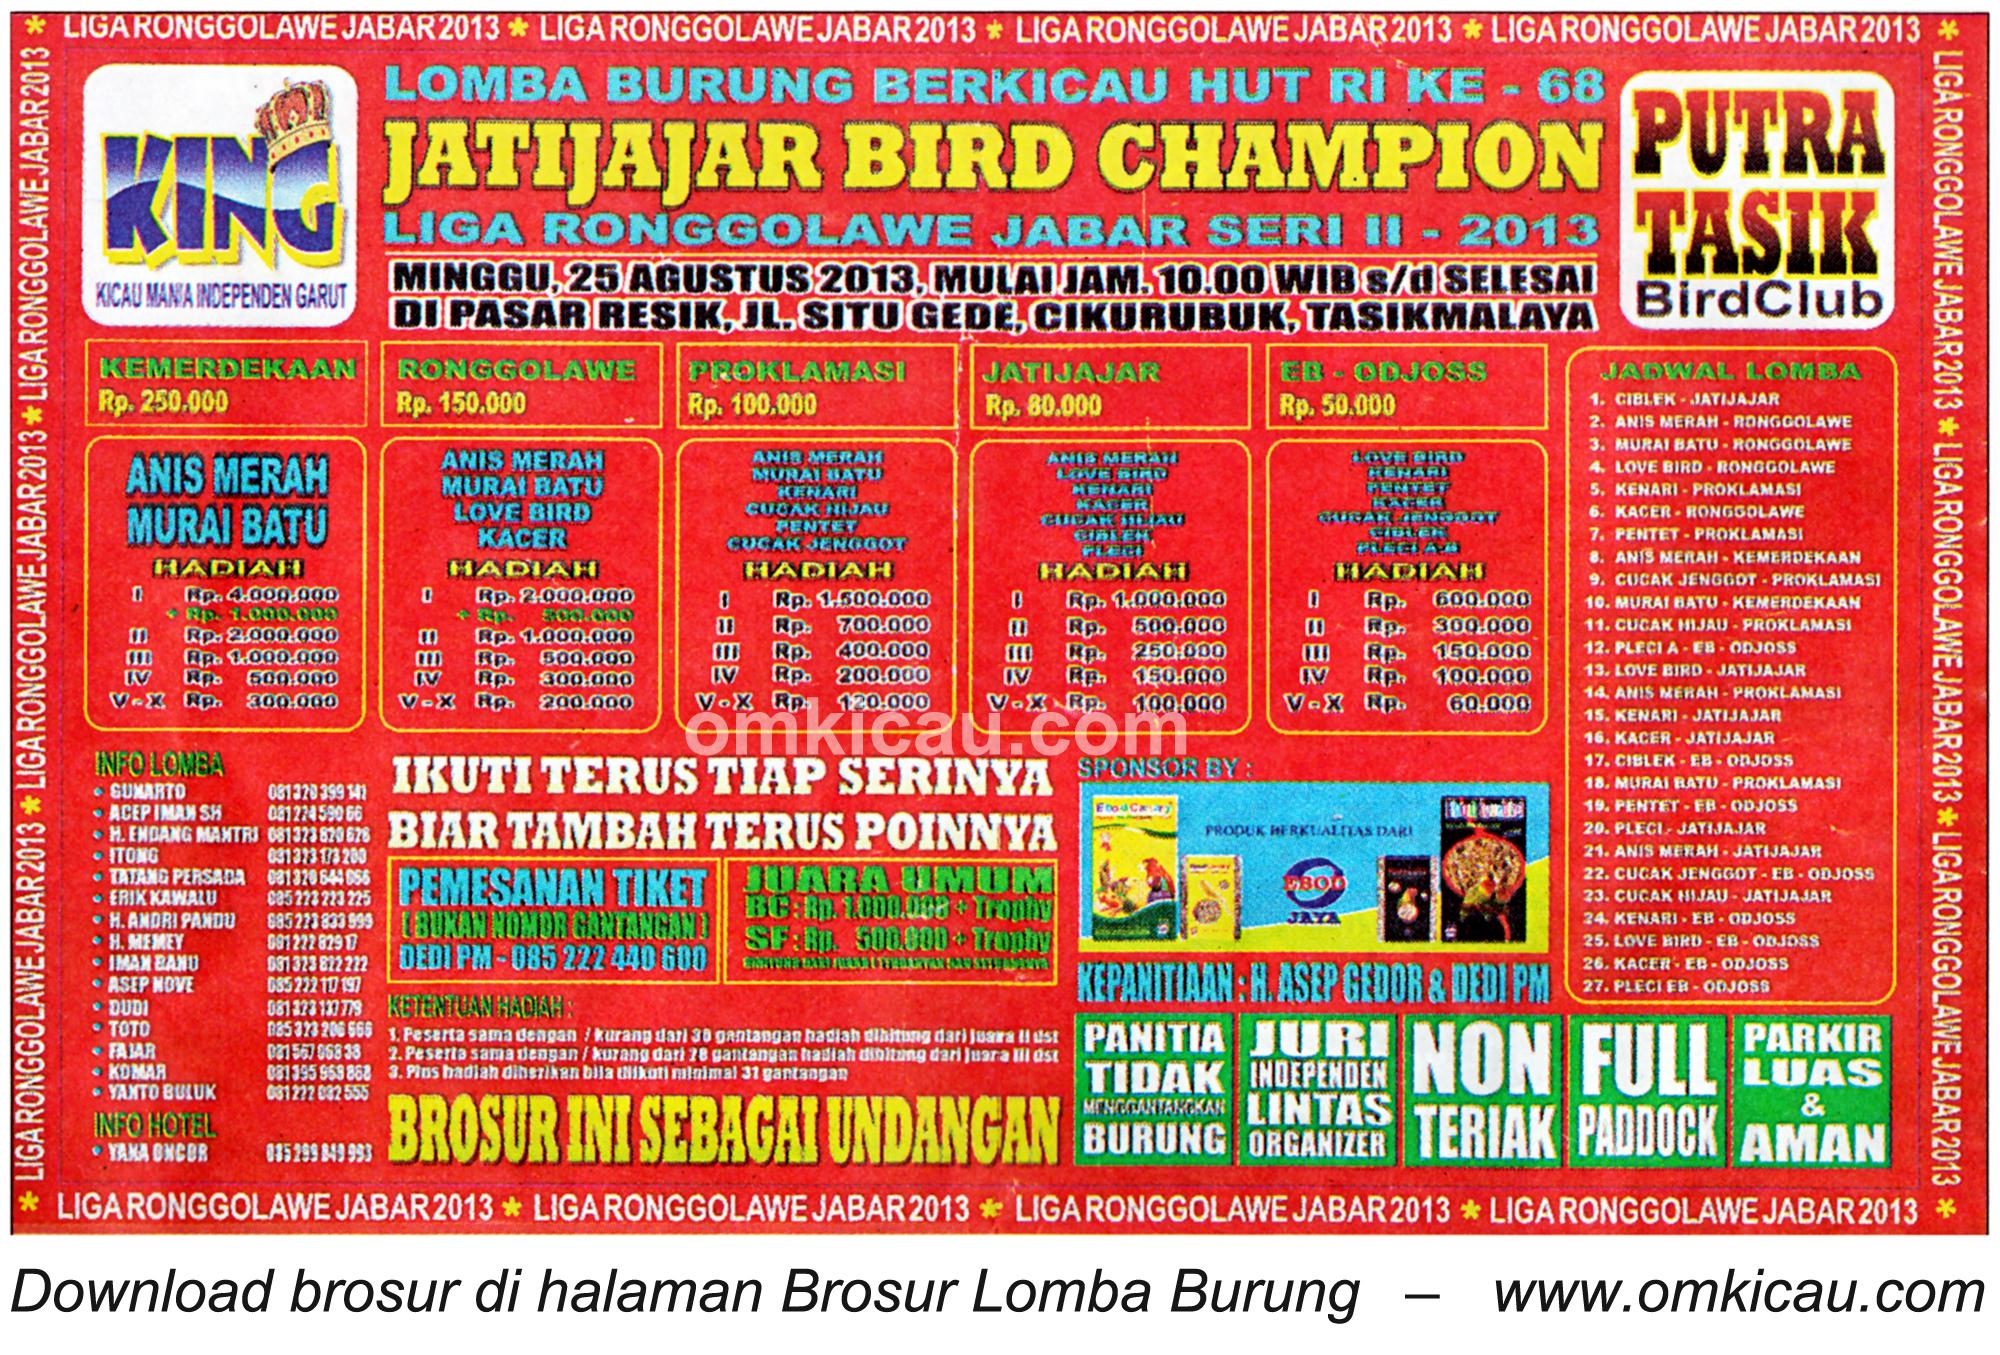 Brosur Lomba Jatijajar Bird Champion Tasikmalaya 25 Agustus 2013